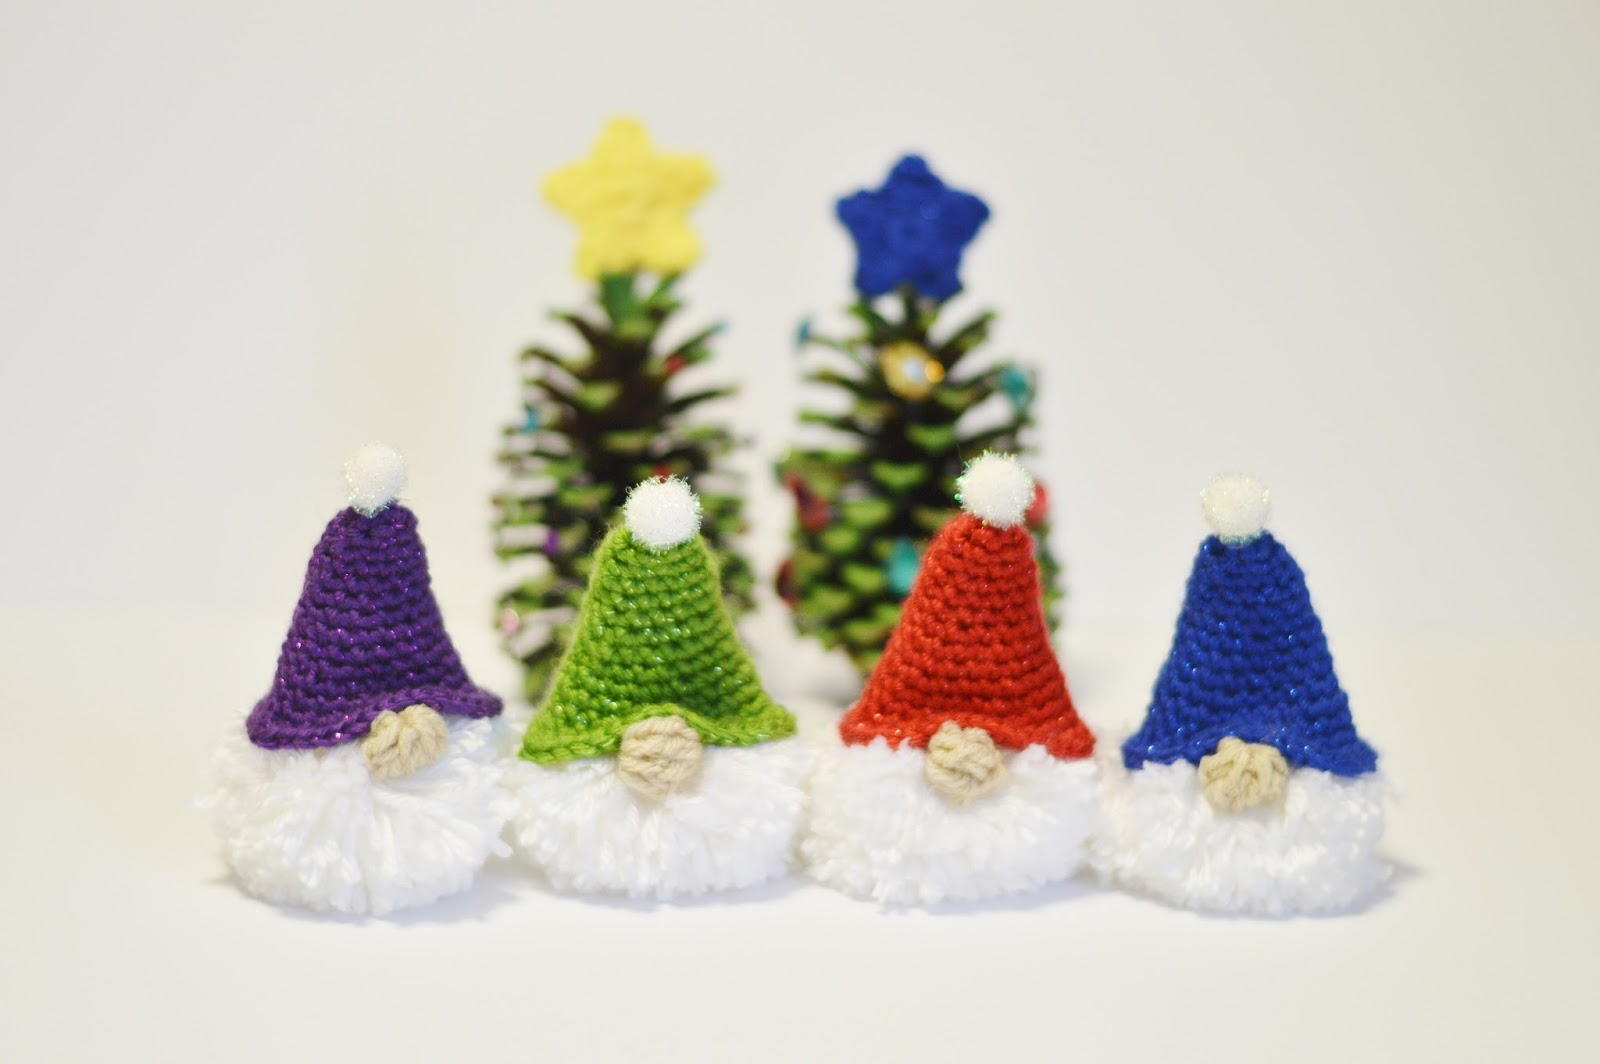 Crochet Patterns Blusas Gnome Amigurumi Crochet Free Pattern ... | 1064x1600